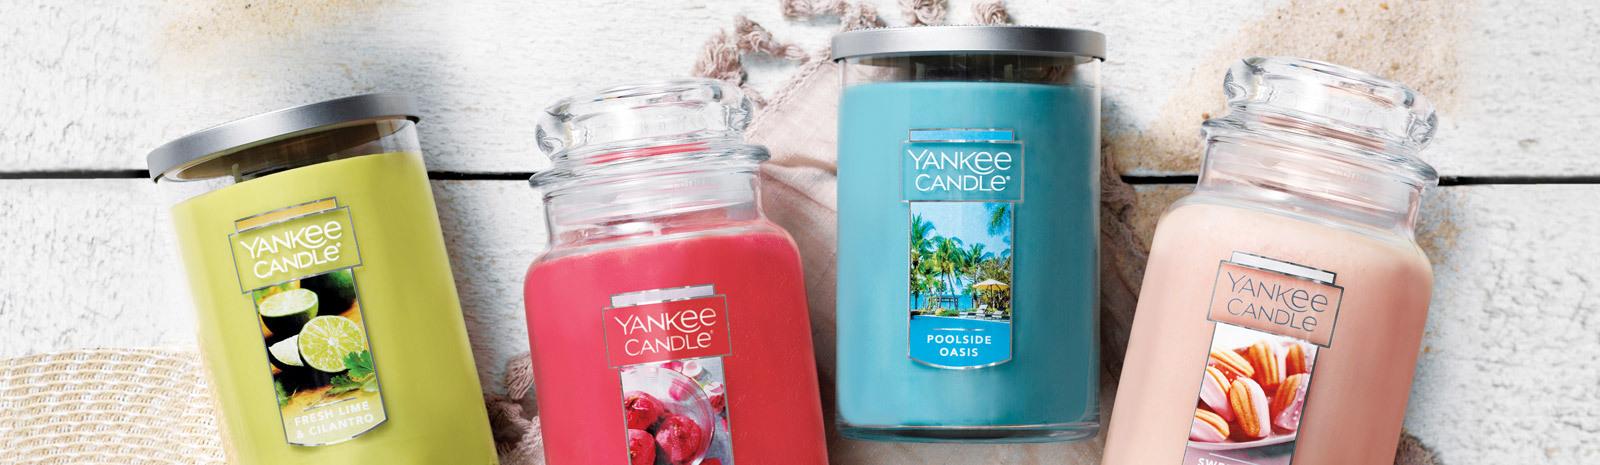 2 for $50 Full-Price Original Large Jar & Large Tumbler Candles - Yankee Candle®